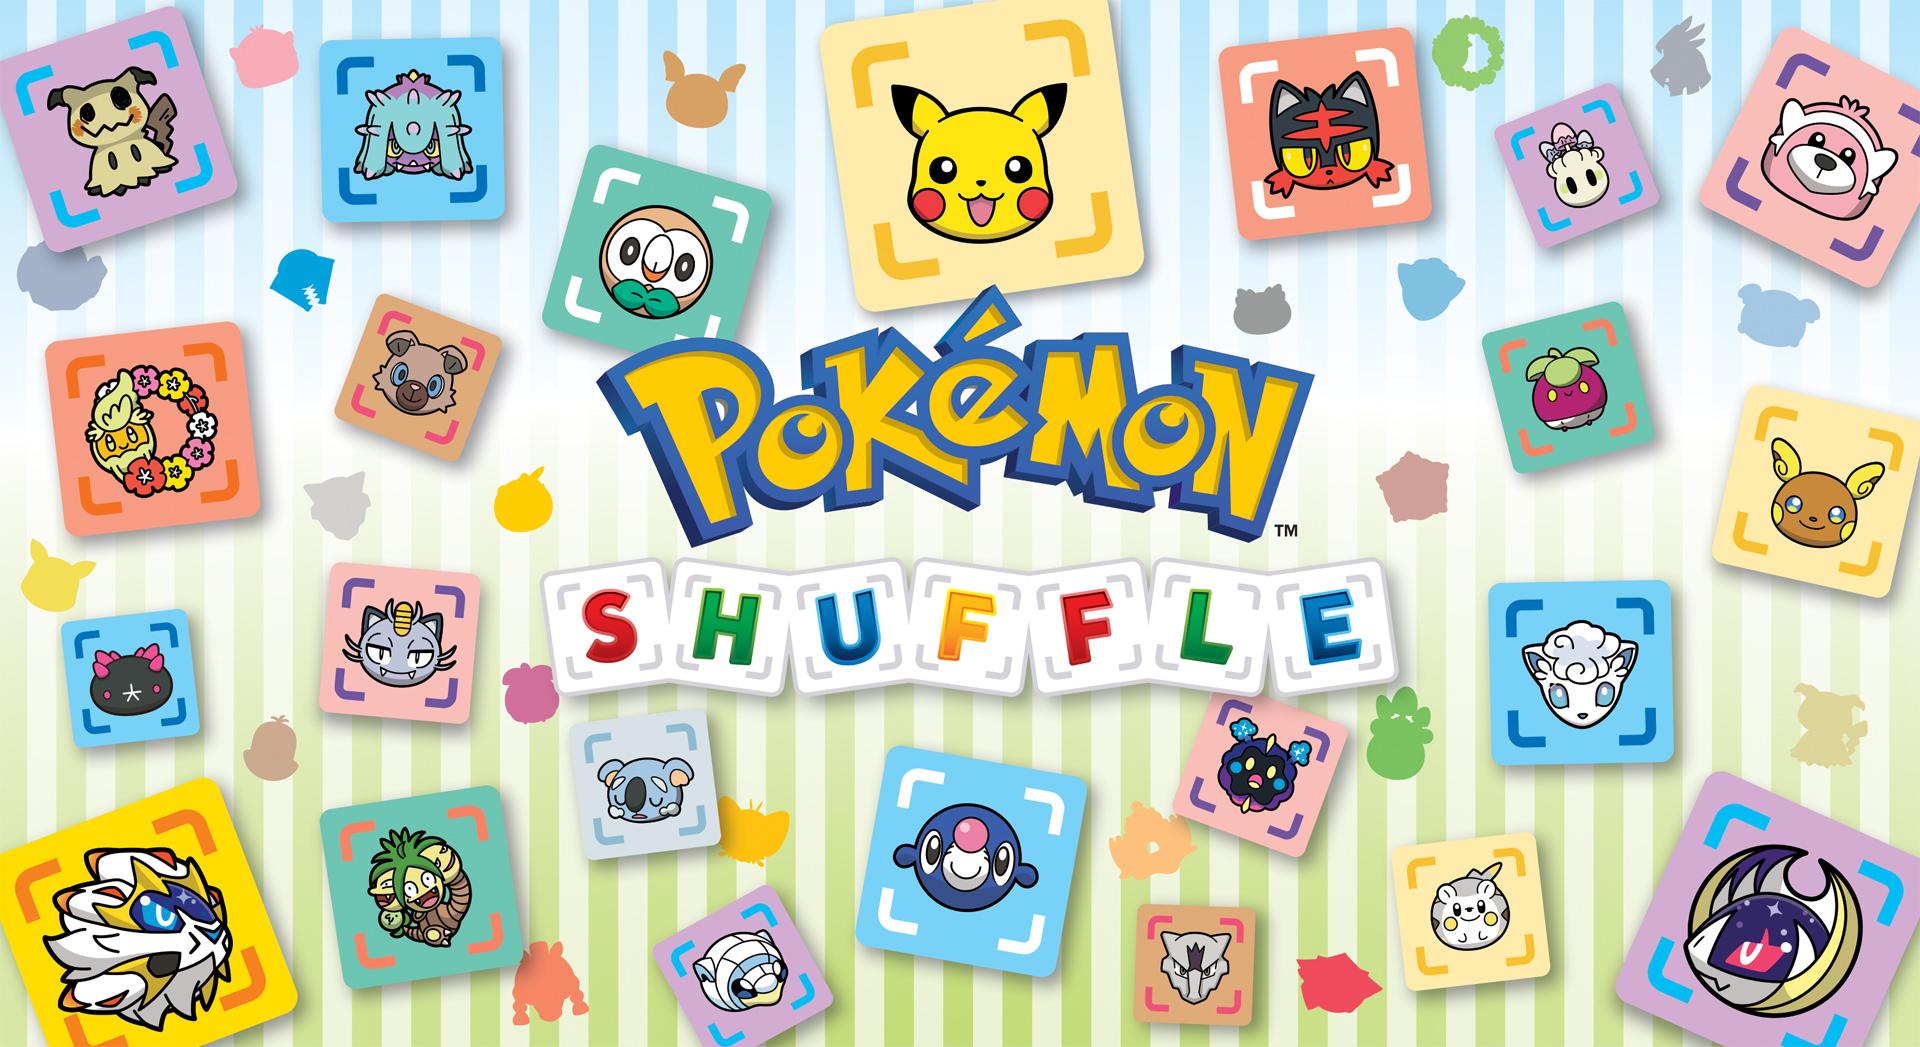 Alolan Pokemon have finally made it to Pokemon Shuffle screenshot